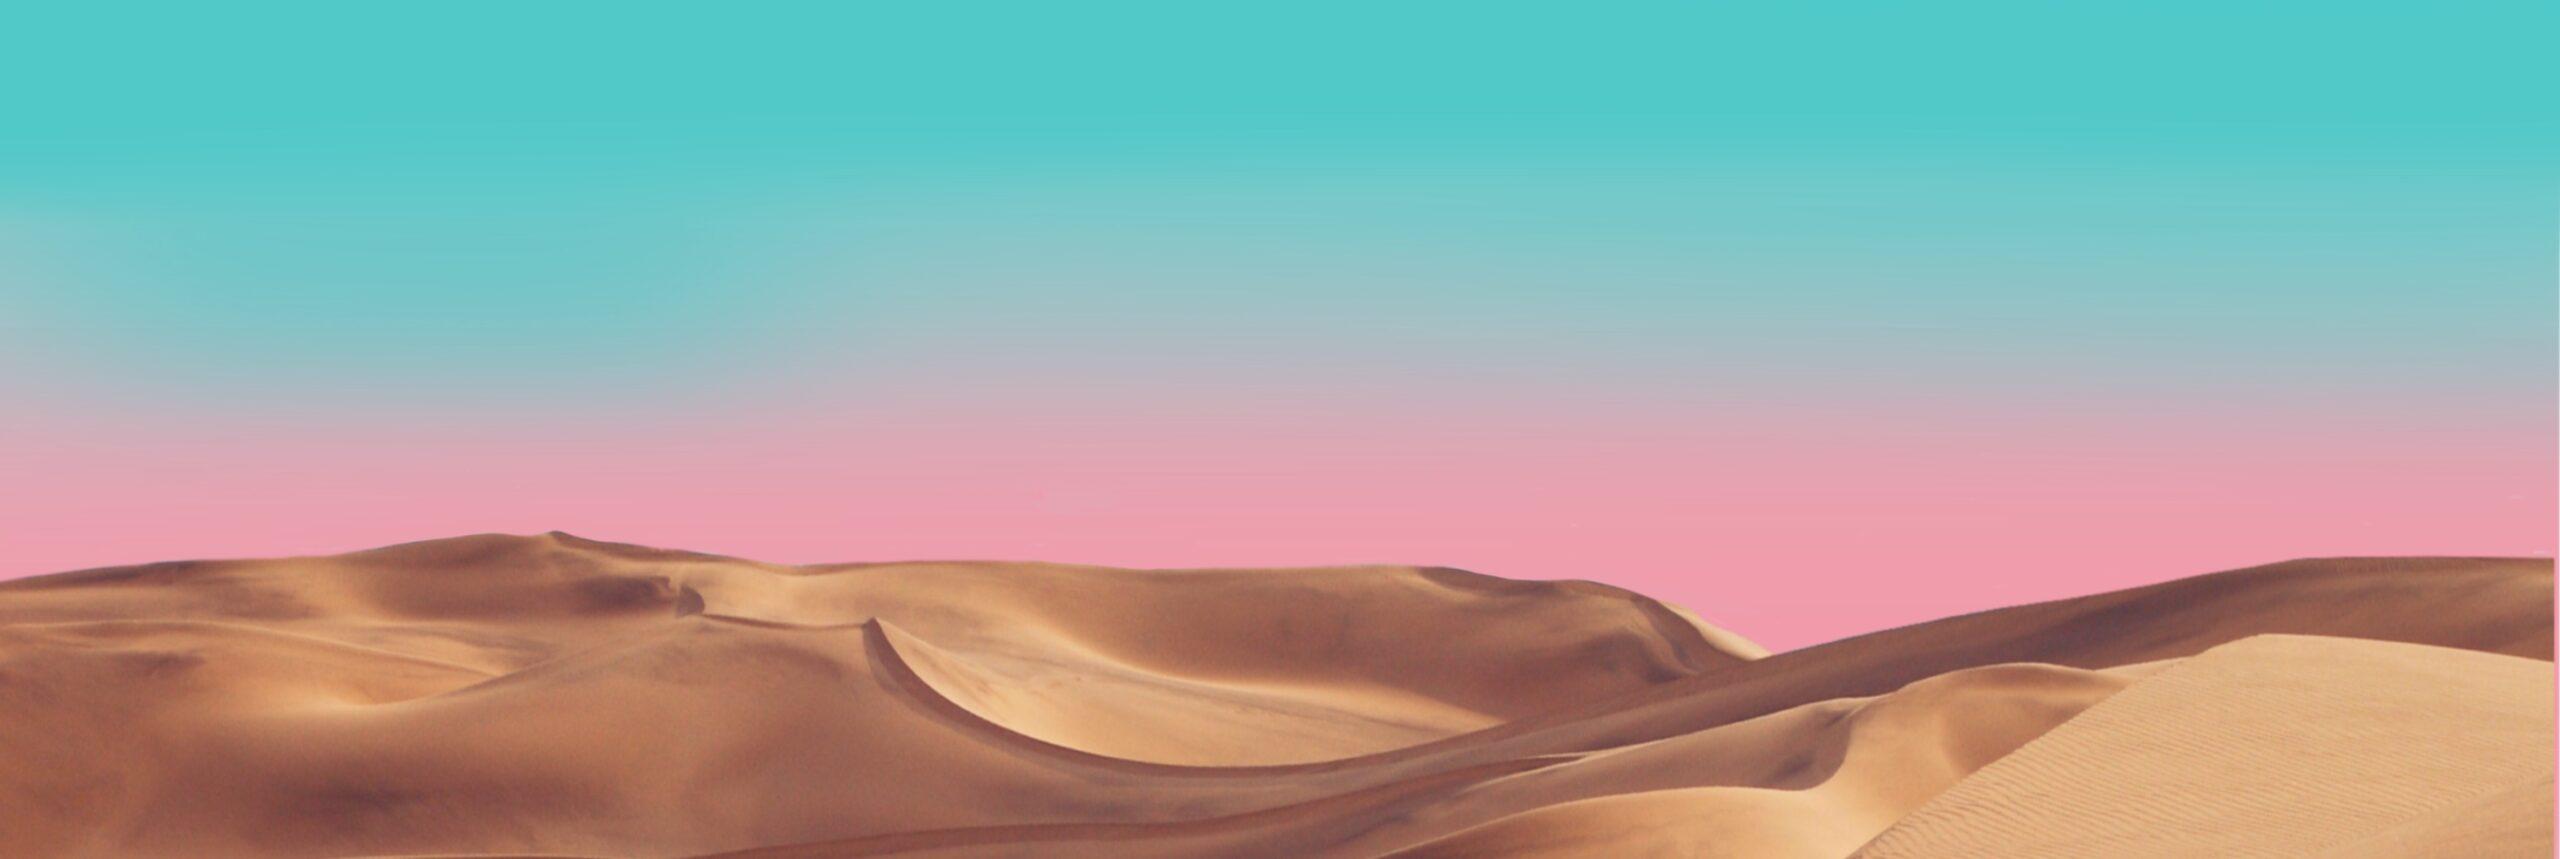 Breathtaking Gradient Desert Landscape